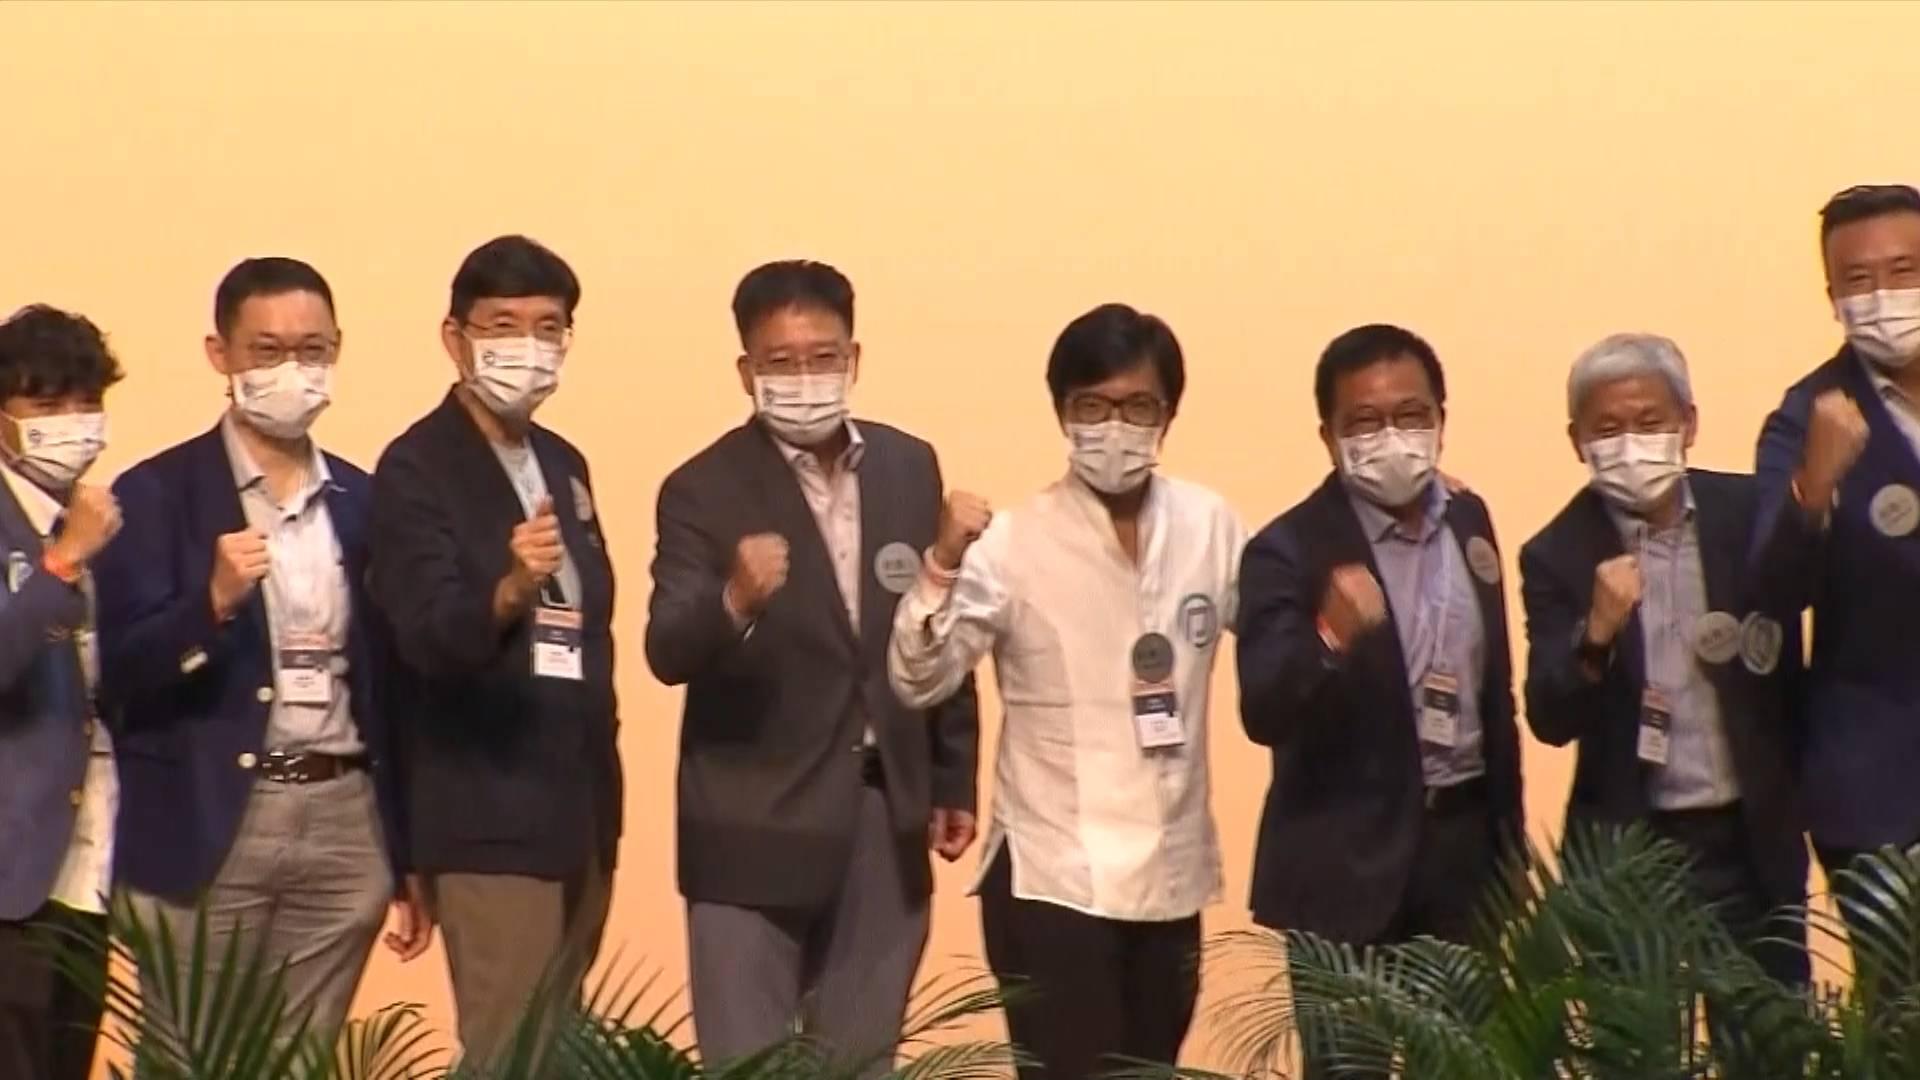 GLOBALink   We must get closer to the people: Hong Kong's Election Committee members